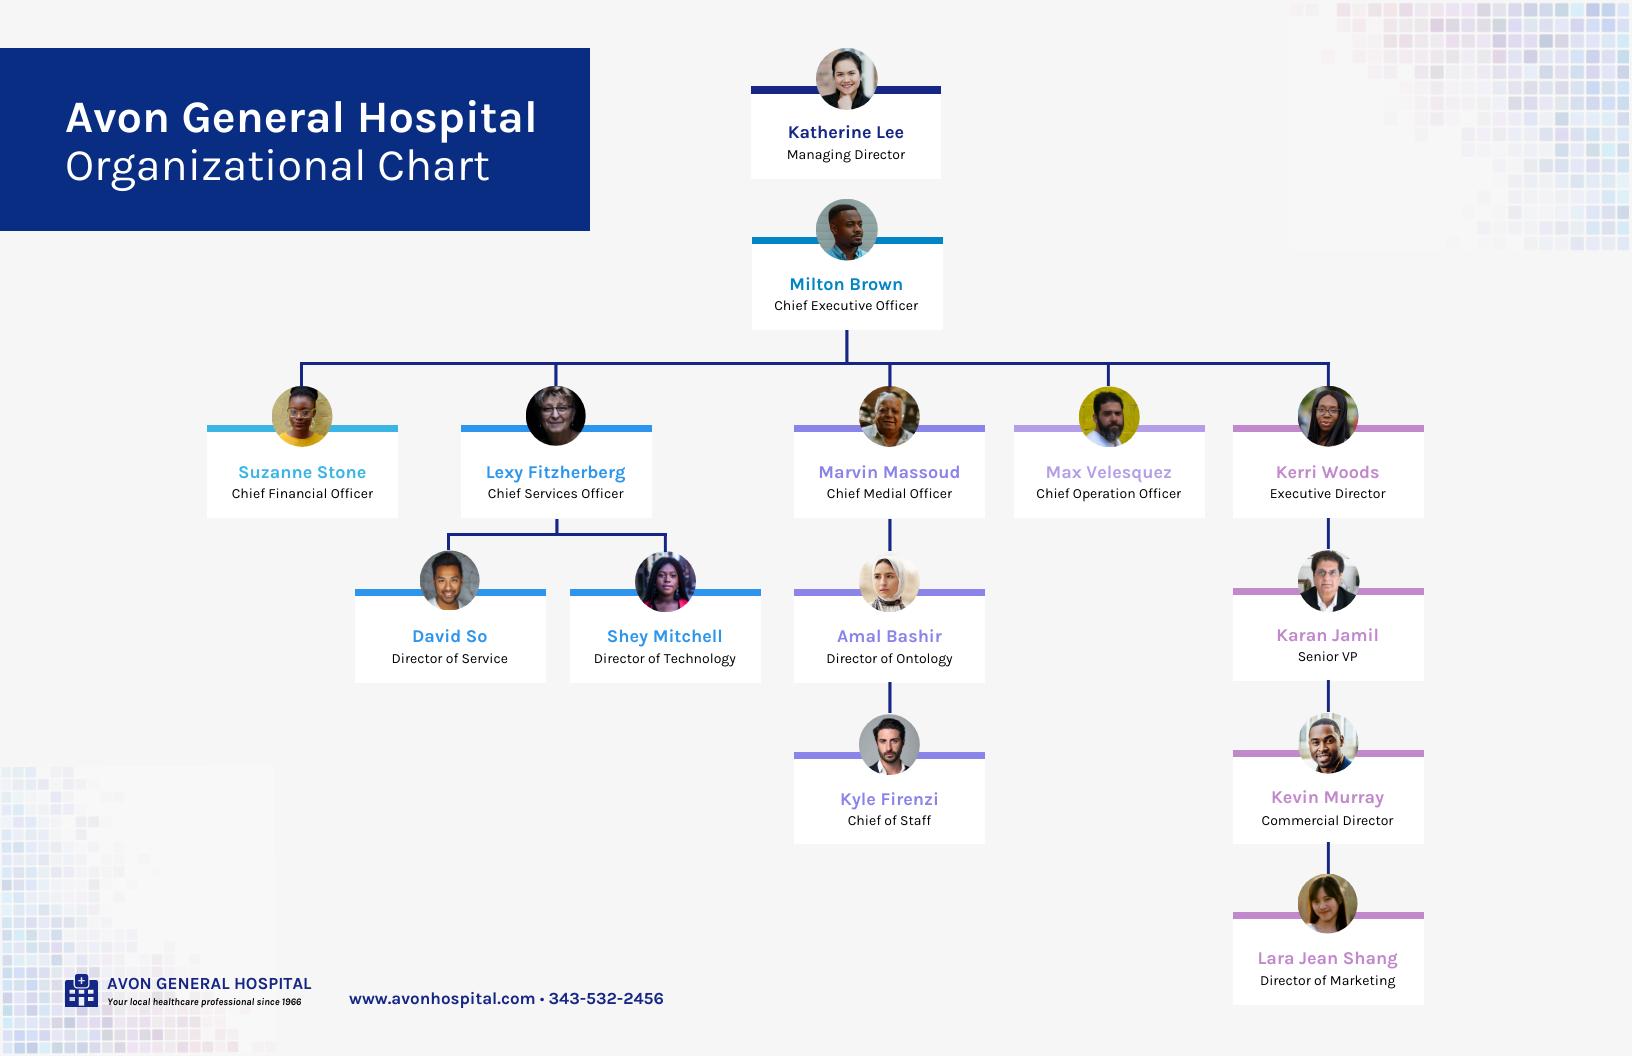 employee training and development organizational chart